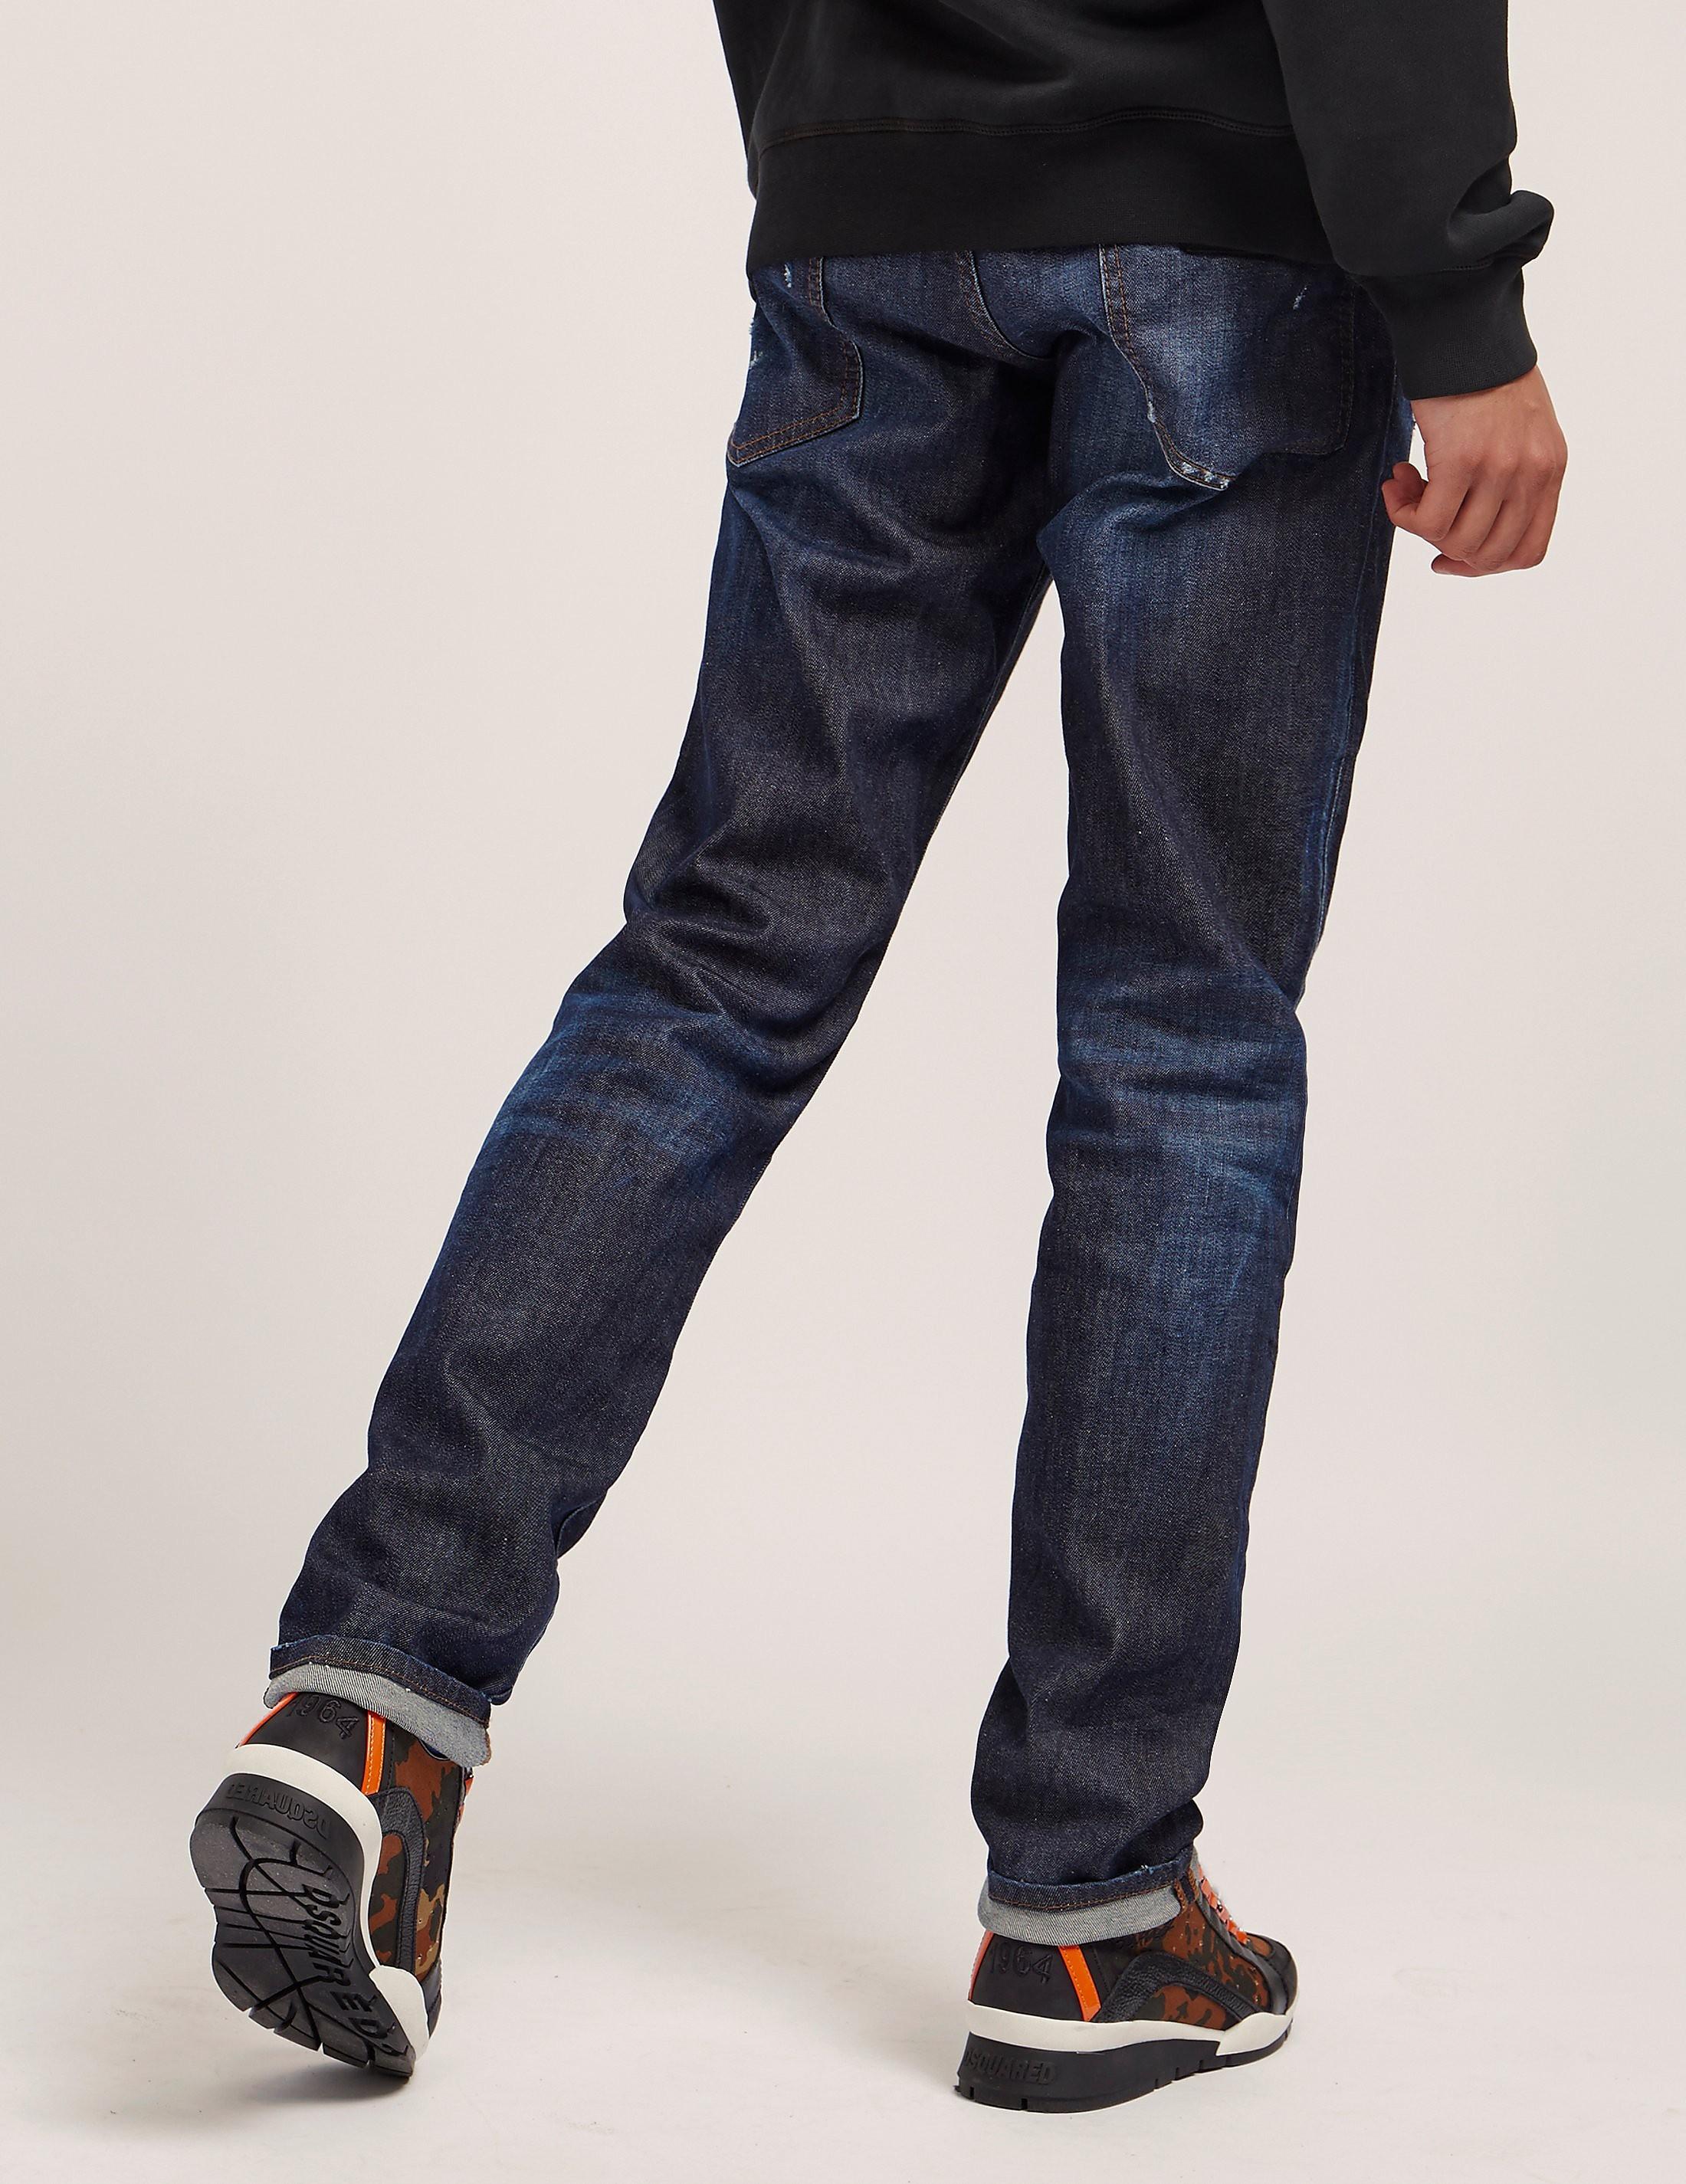 DSQUARED2 Plaque Slim Jeans